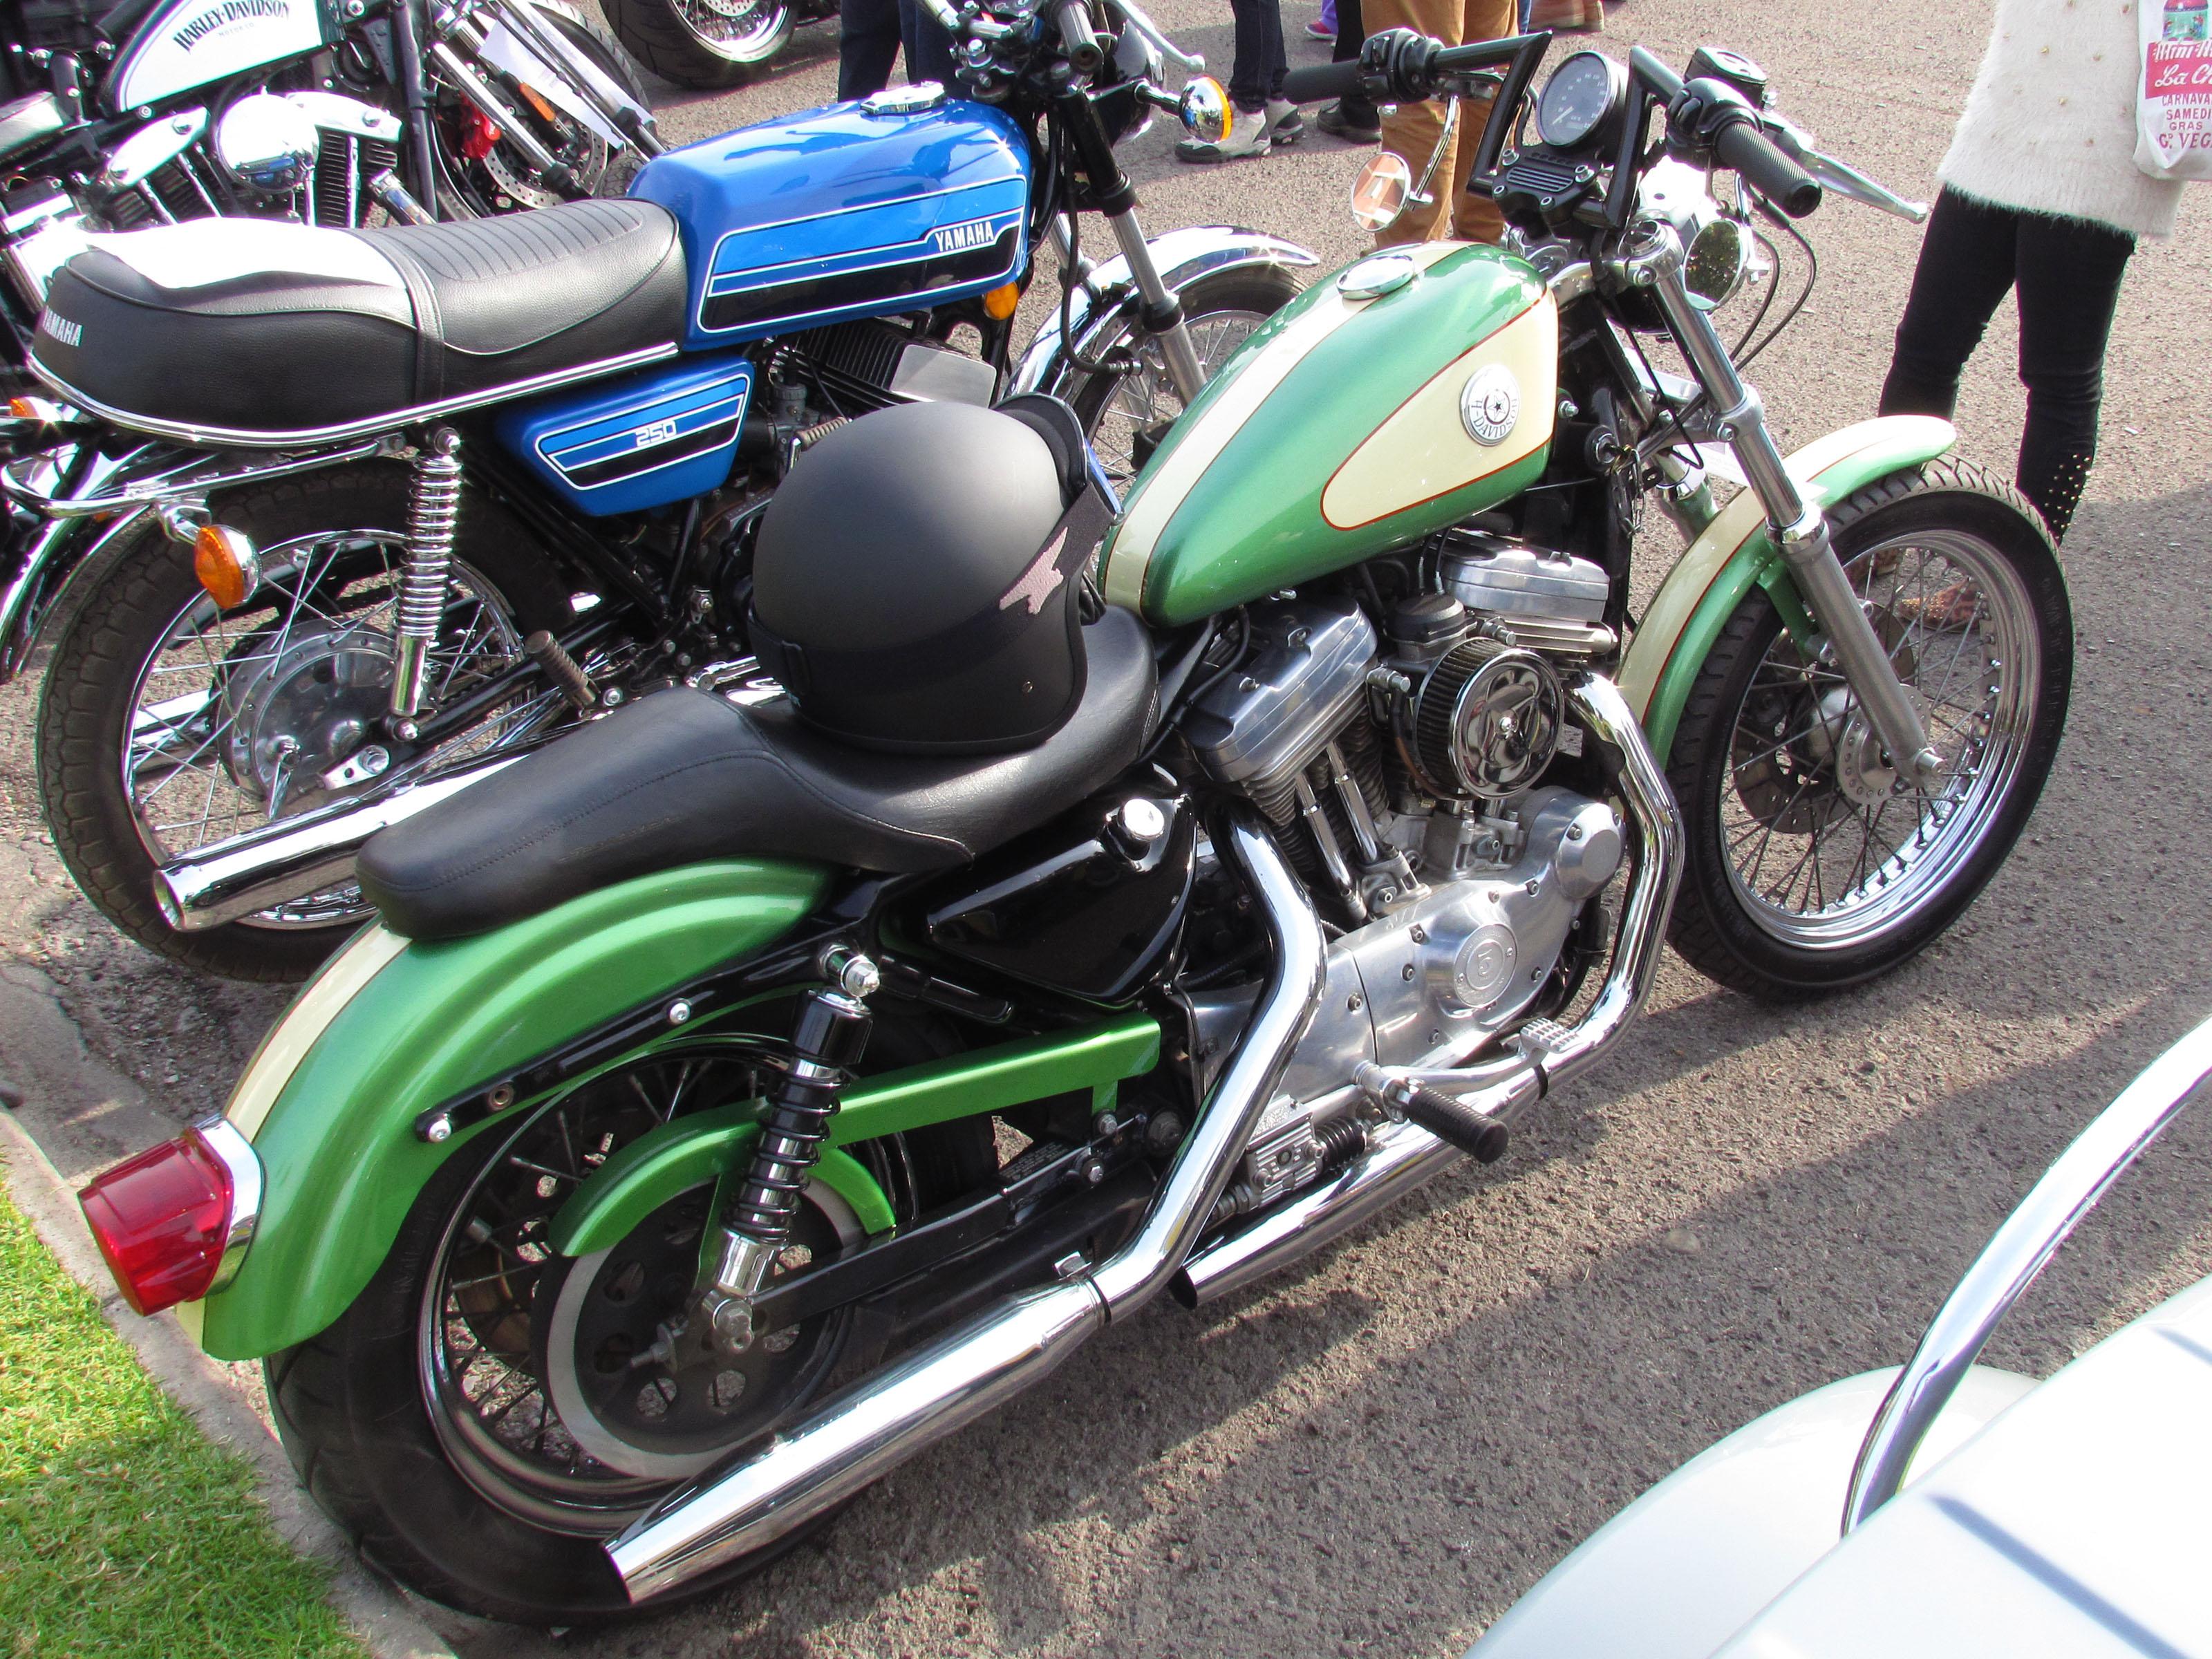 File:Harley Davidson 883 Sportster 1997 (14122005799).jpg